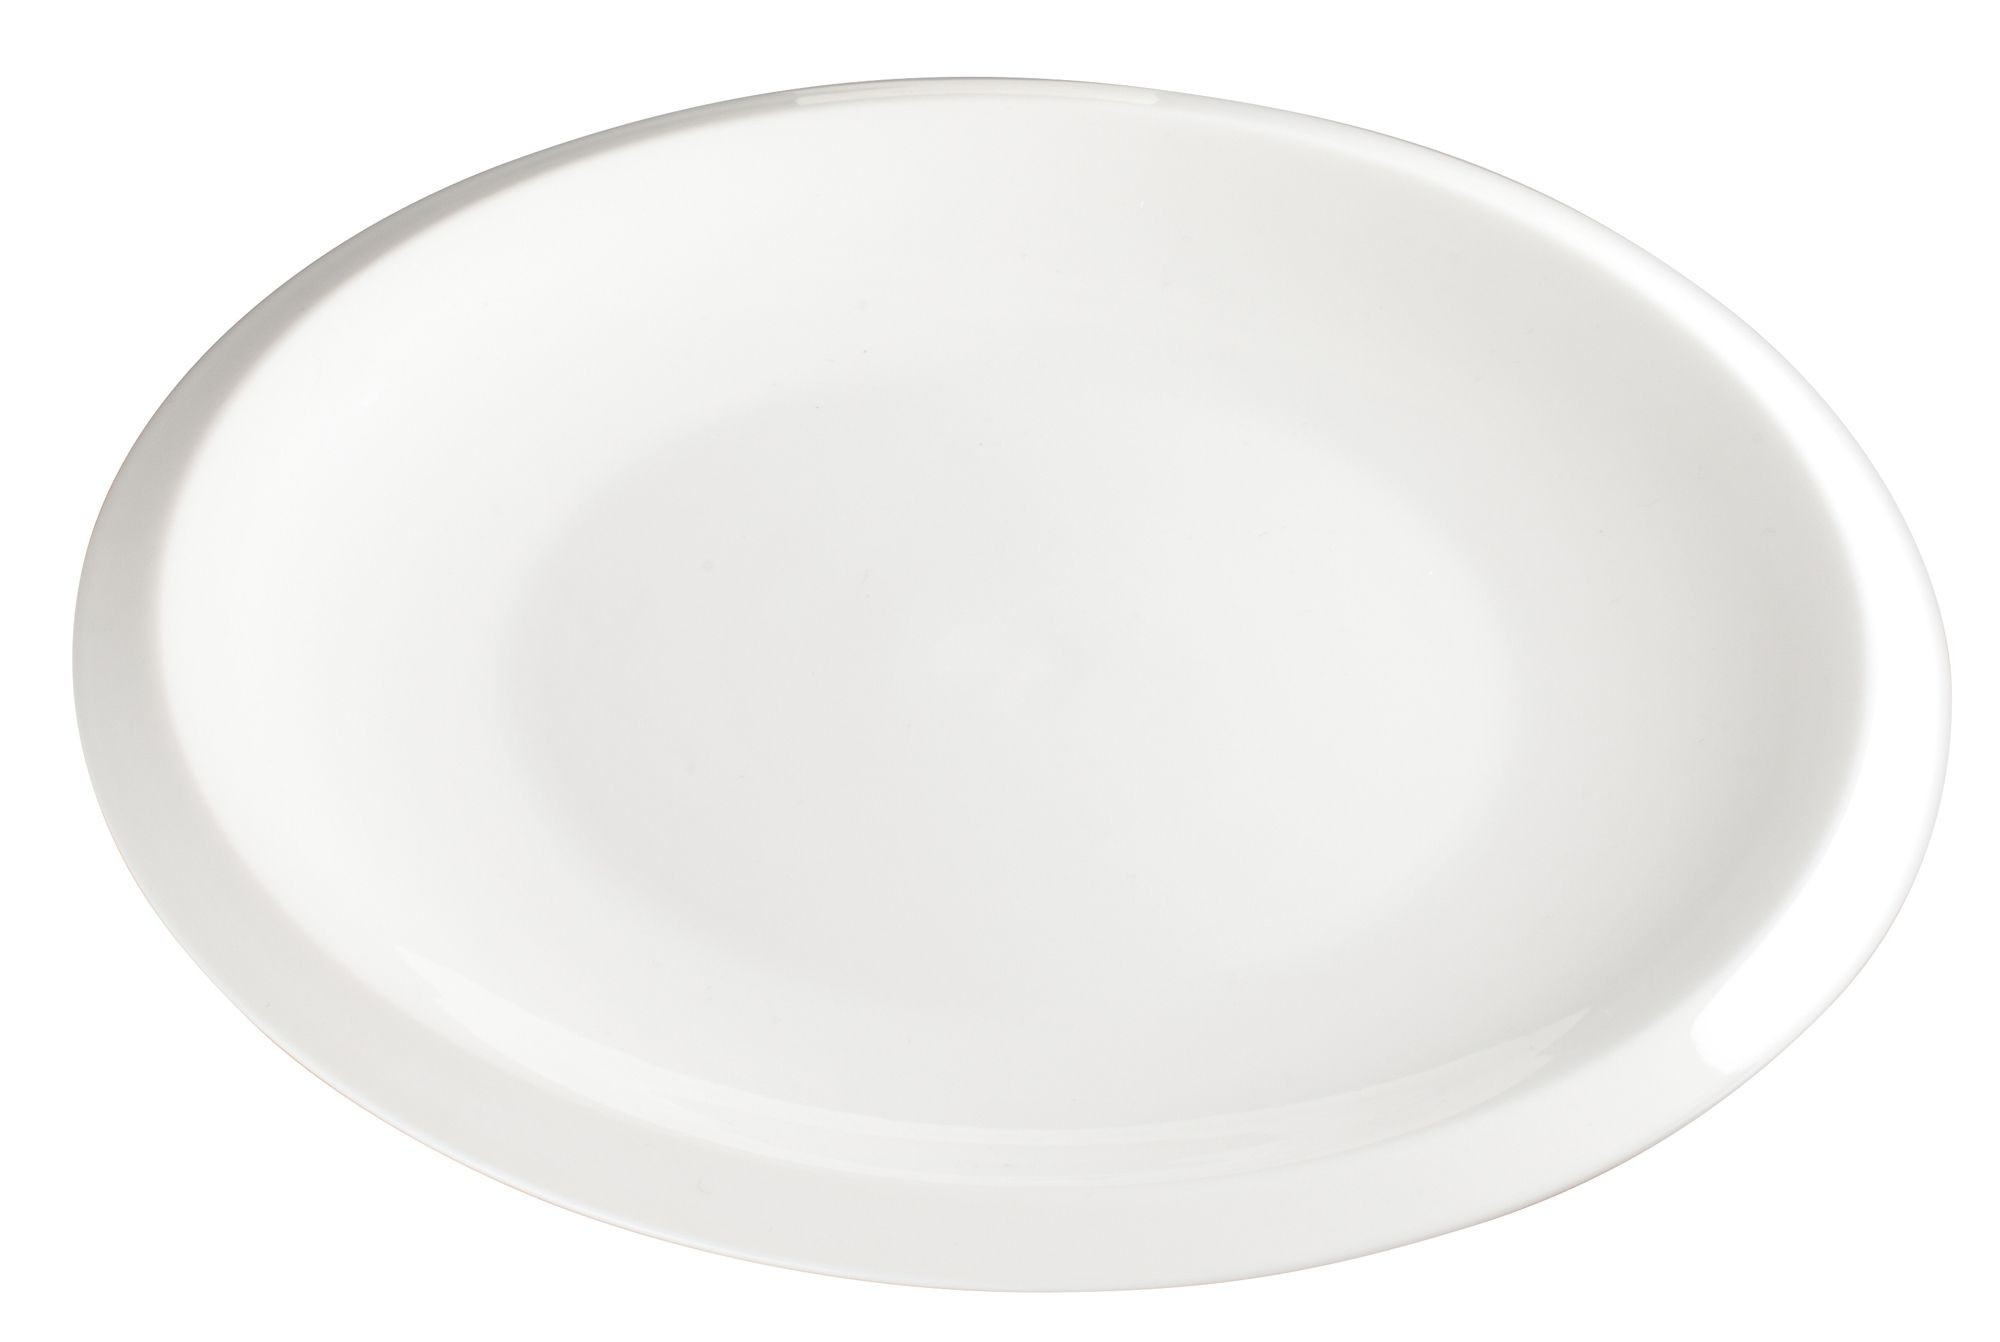 "Winco WDP006-202 Bergomi Creamy White Porcelain Round Platter 10-1/4"" Dia."